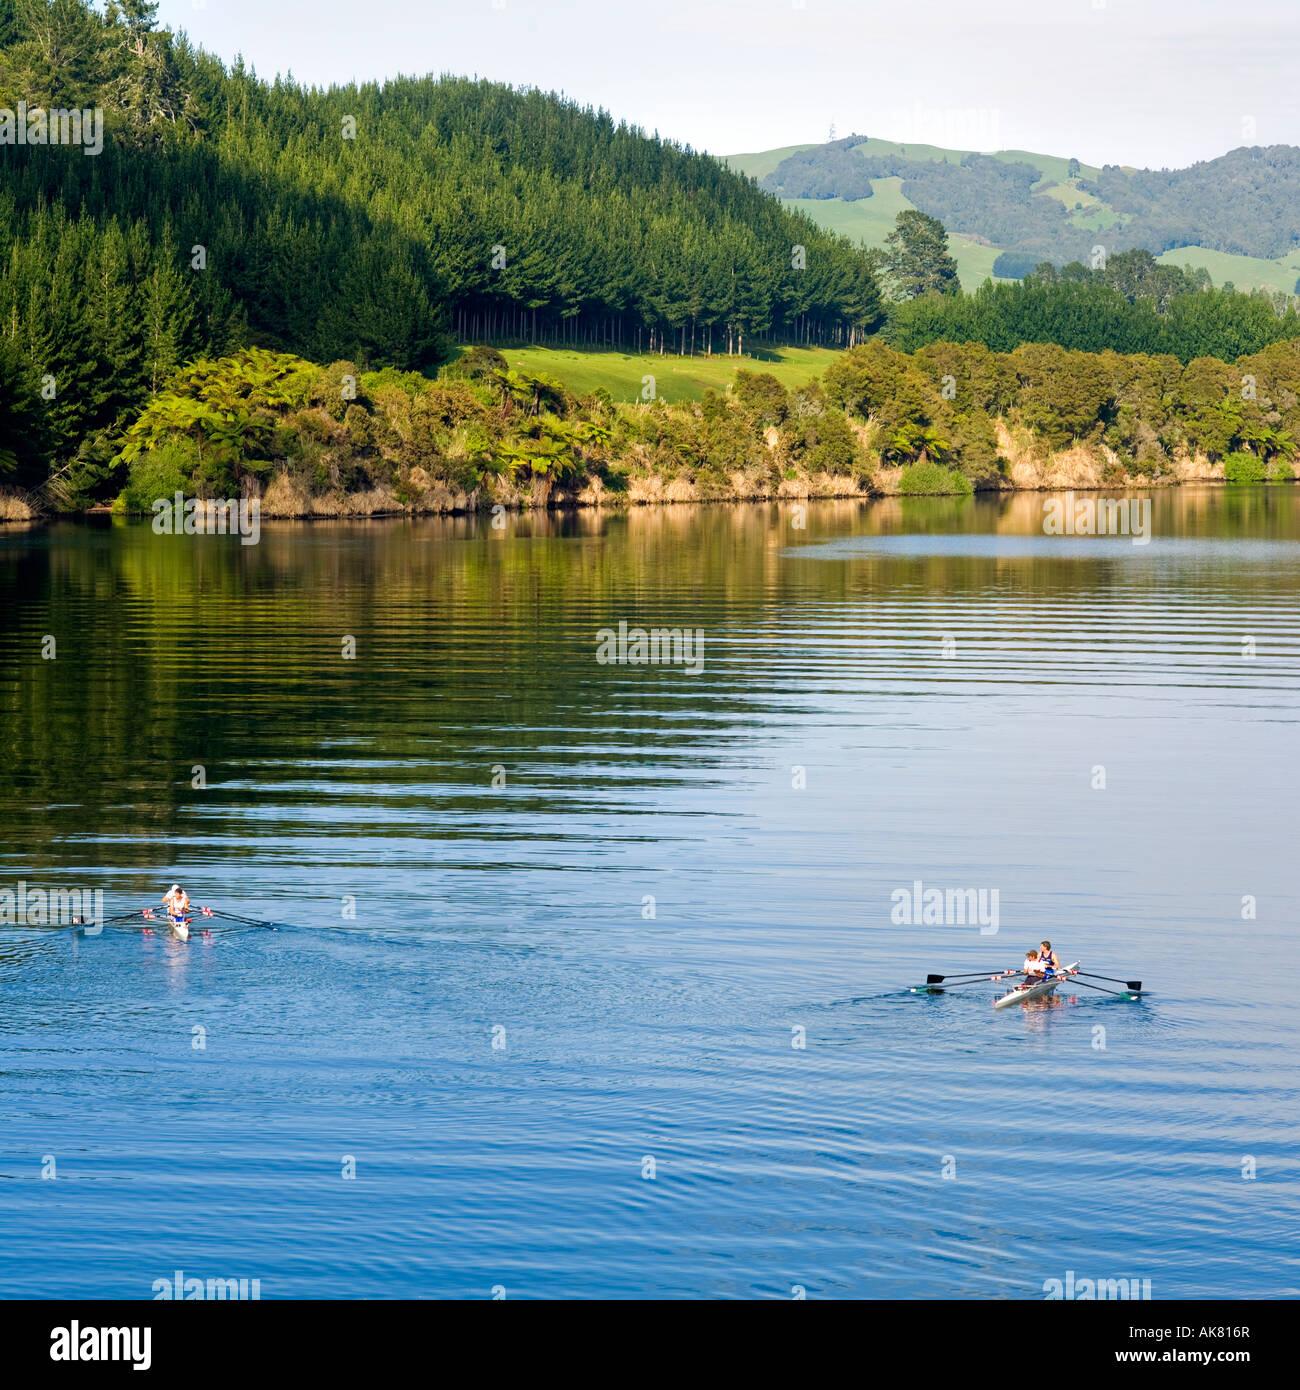 Rowing training on the Waikato River New Zealand - Stock Image